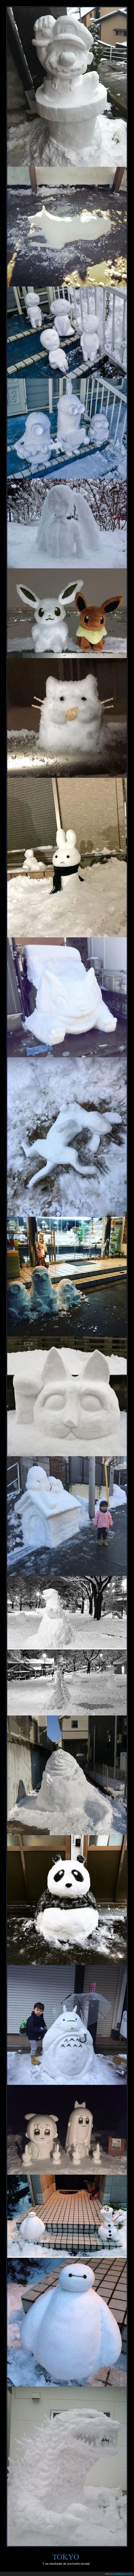 munecos de nieve en japon